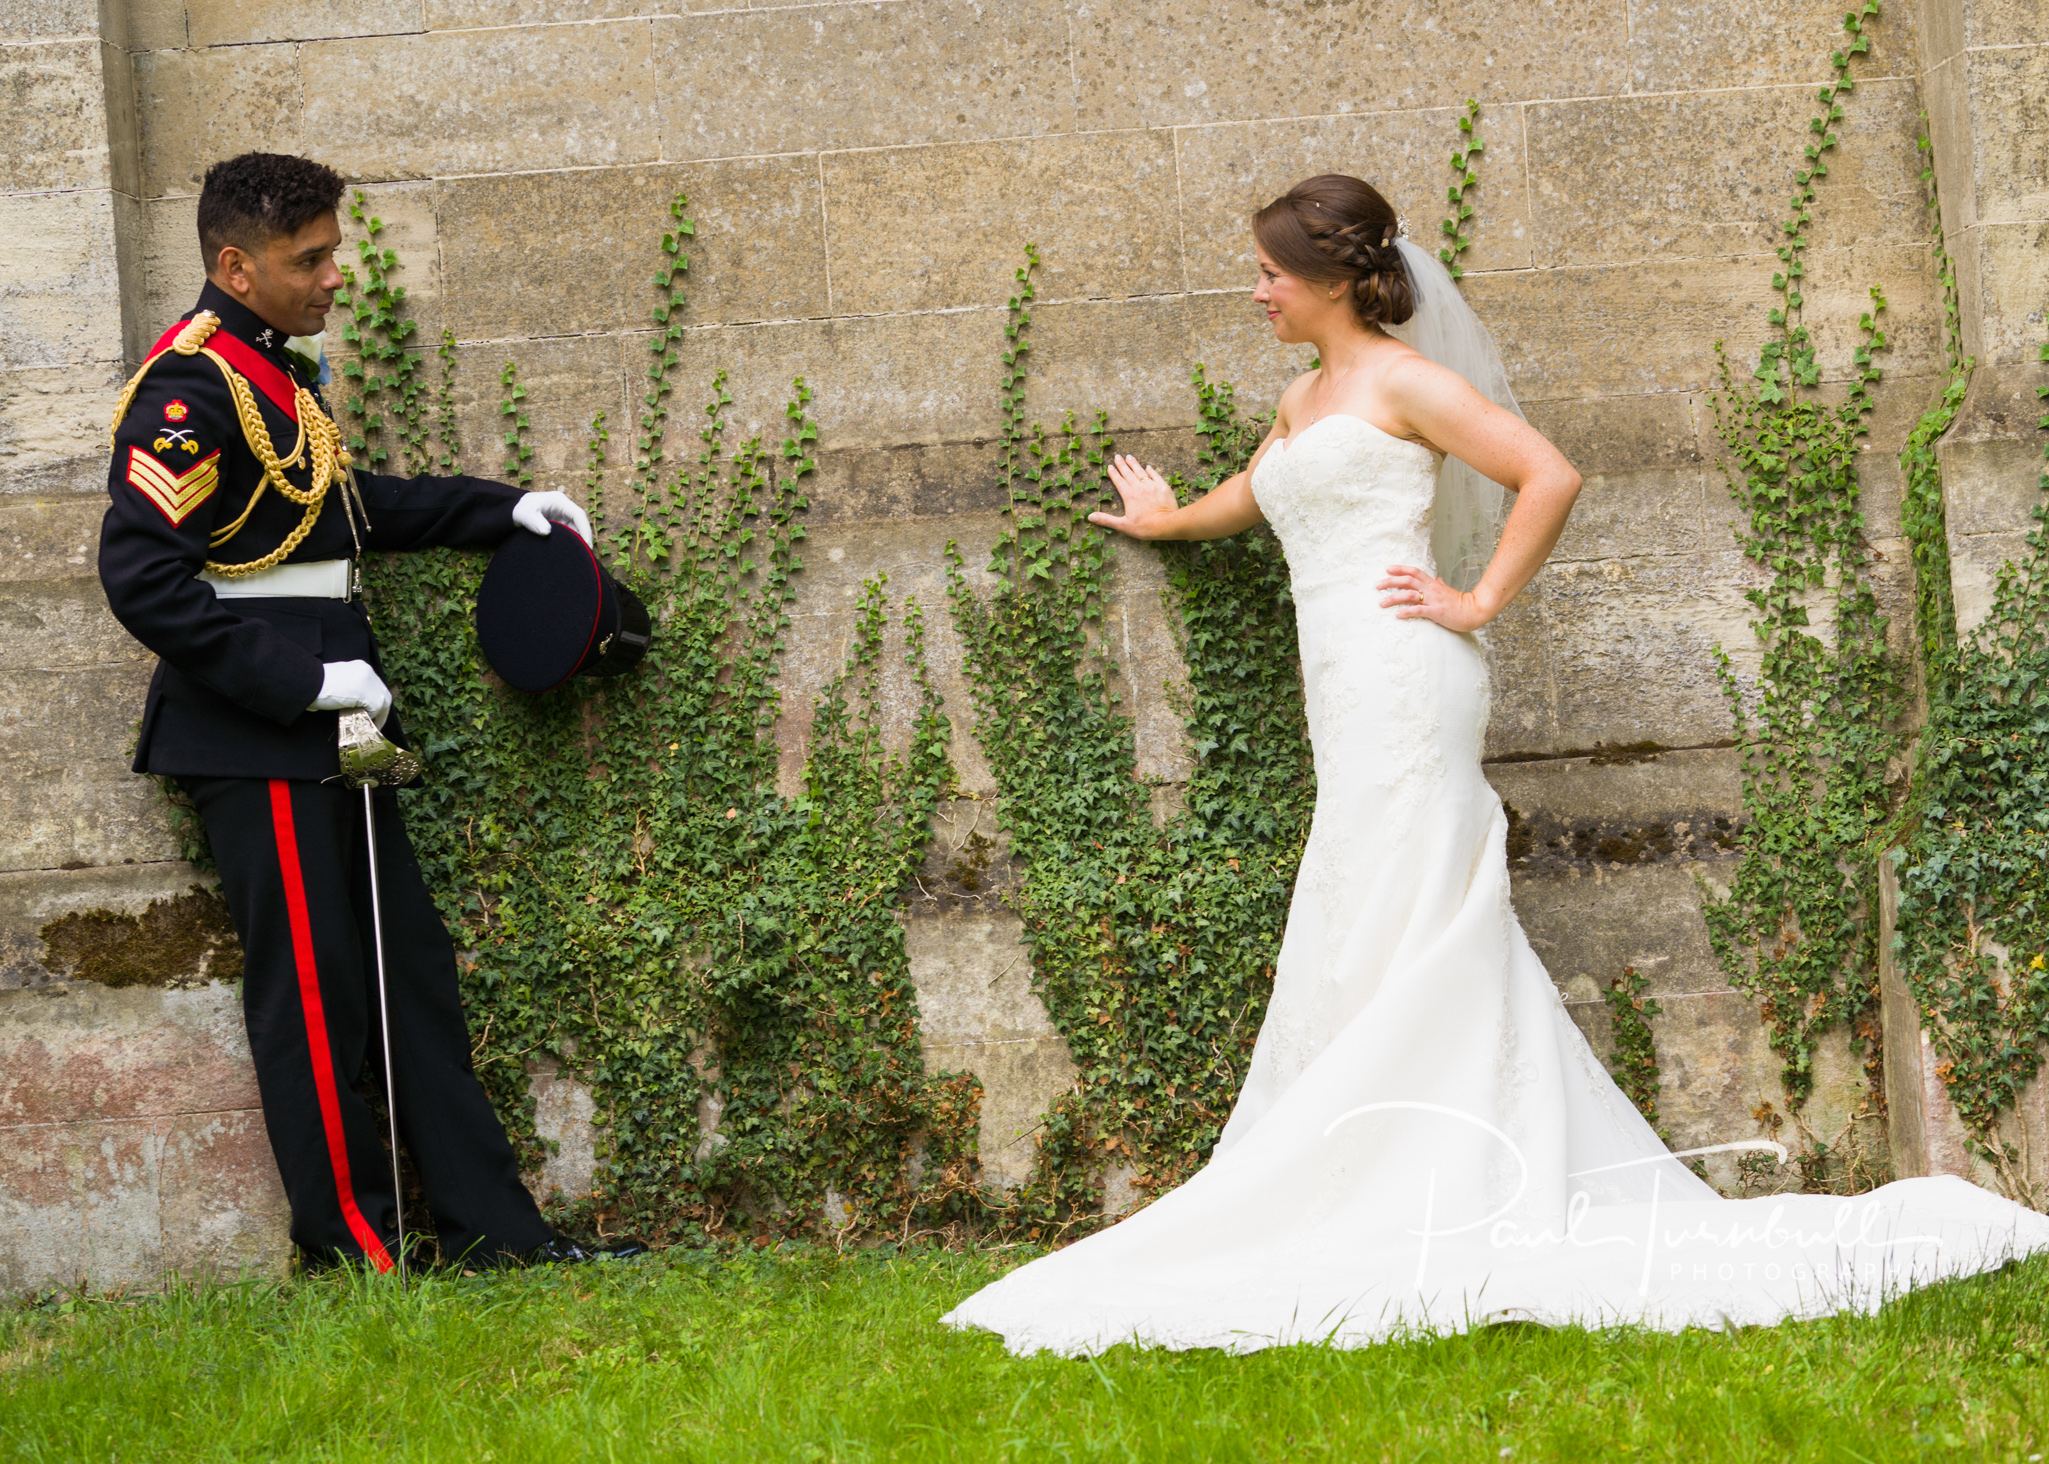 wedding-photographer-south-dalton-walkington-yorkshire-emma-james-047.jpg